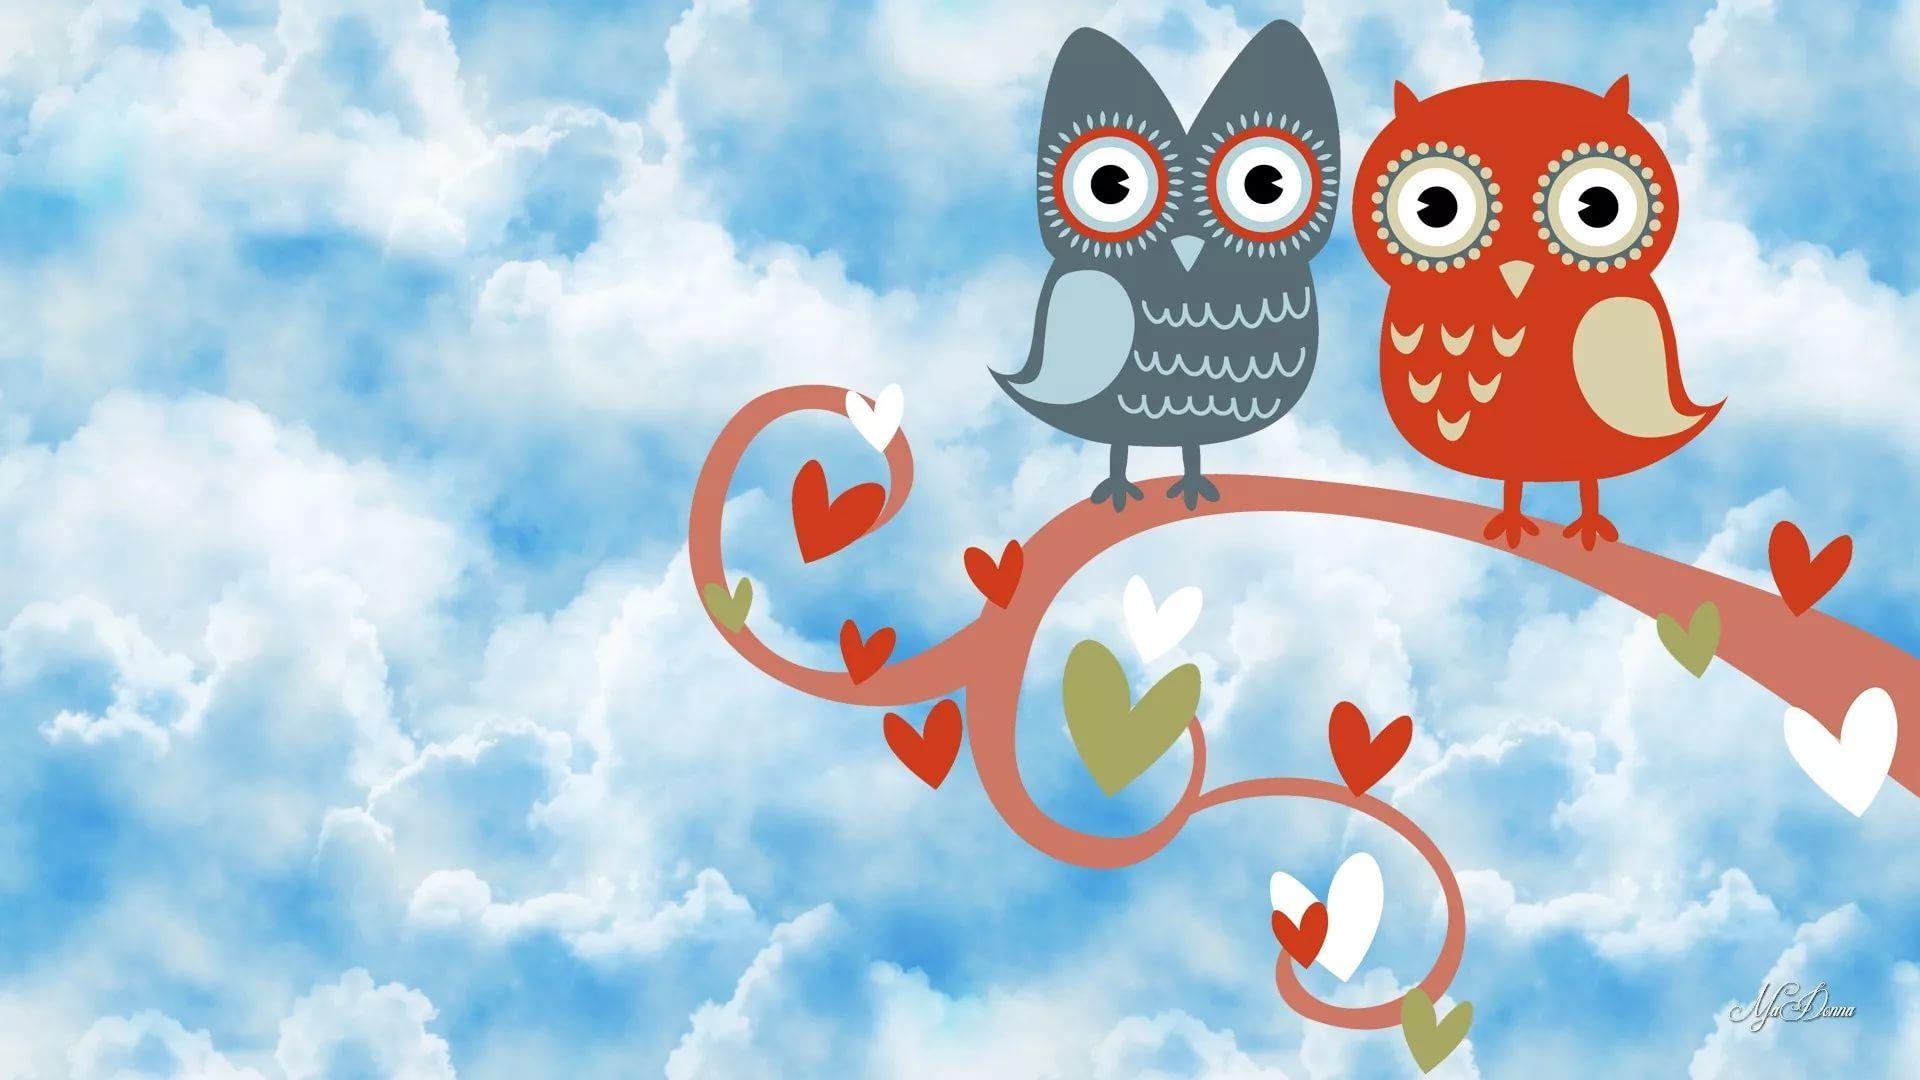 Cute Owl screen wallpaper